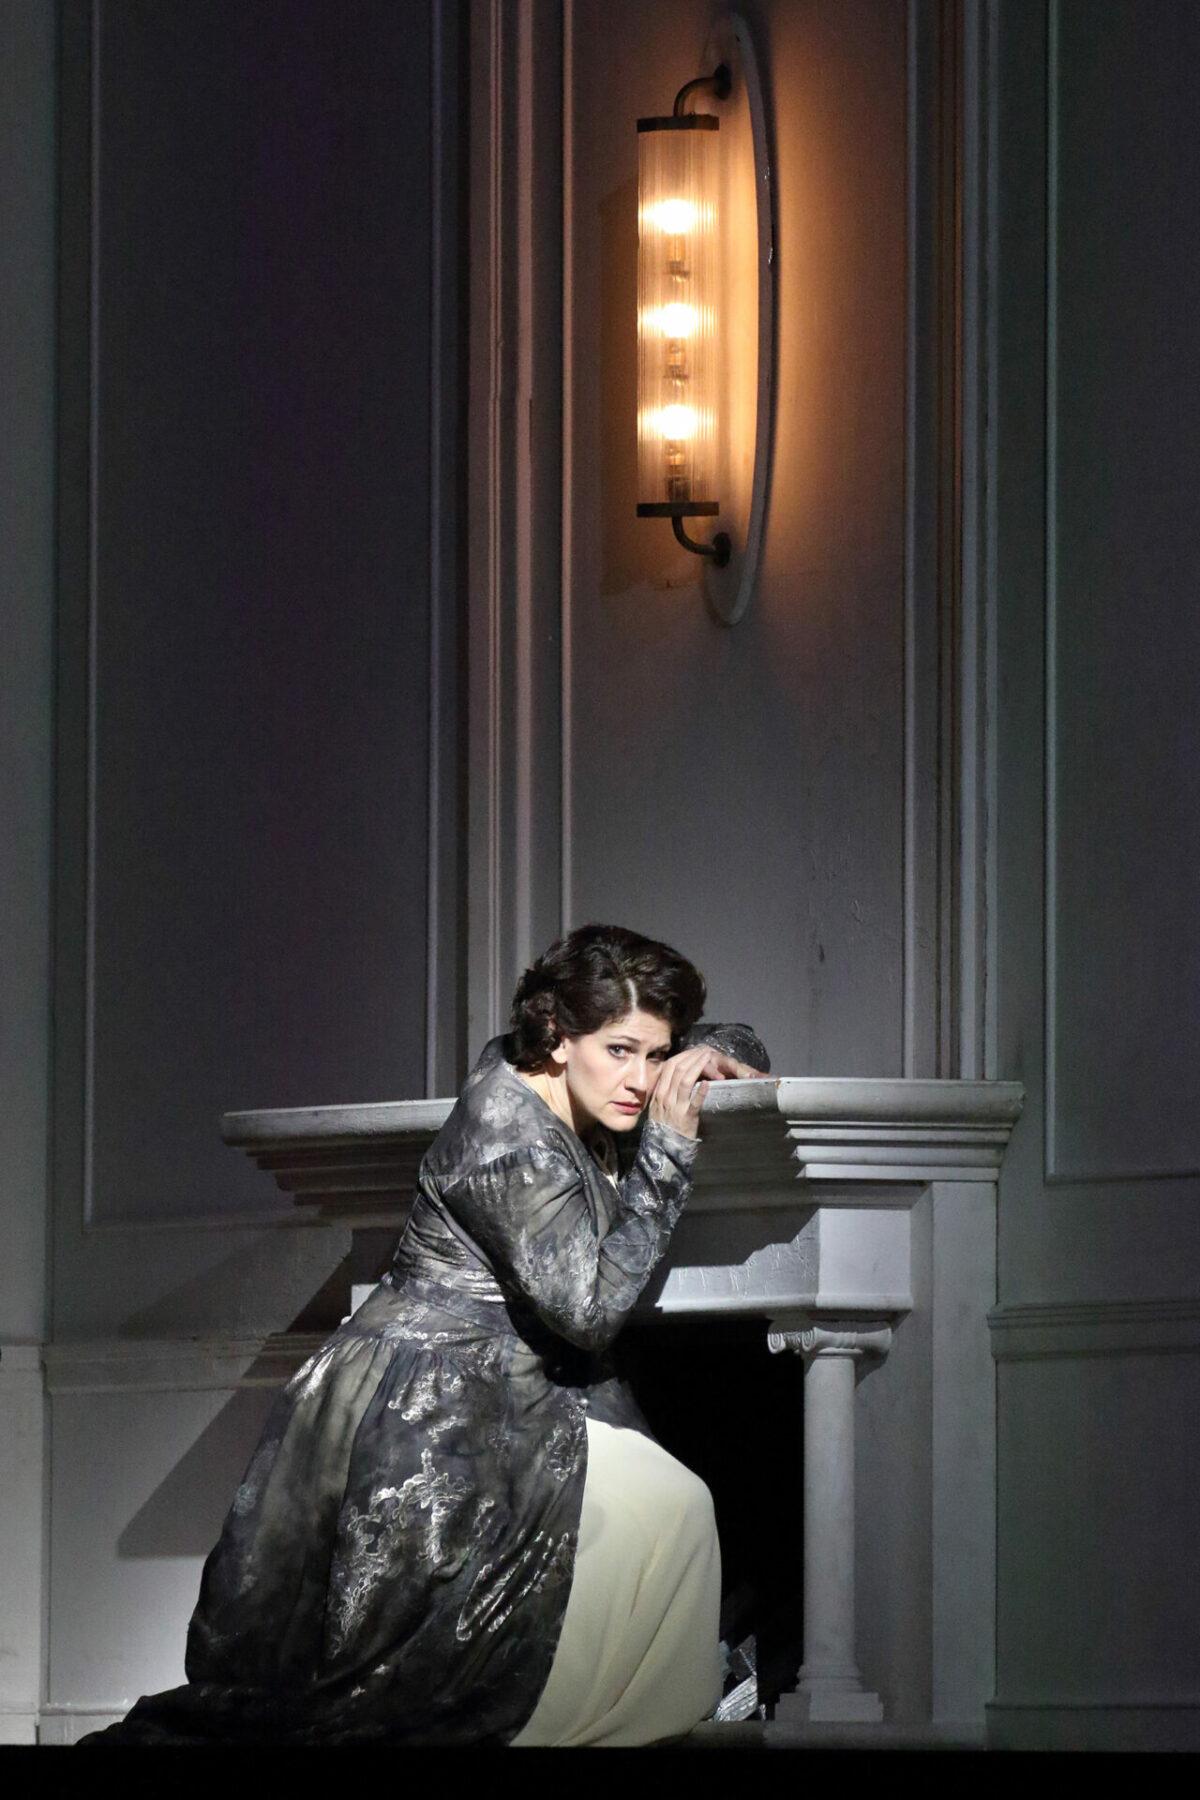 Giuseppe Verdi, Otello  Nationaltheater München, Münchner Opernfestspiele,21. Juli 2021